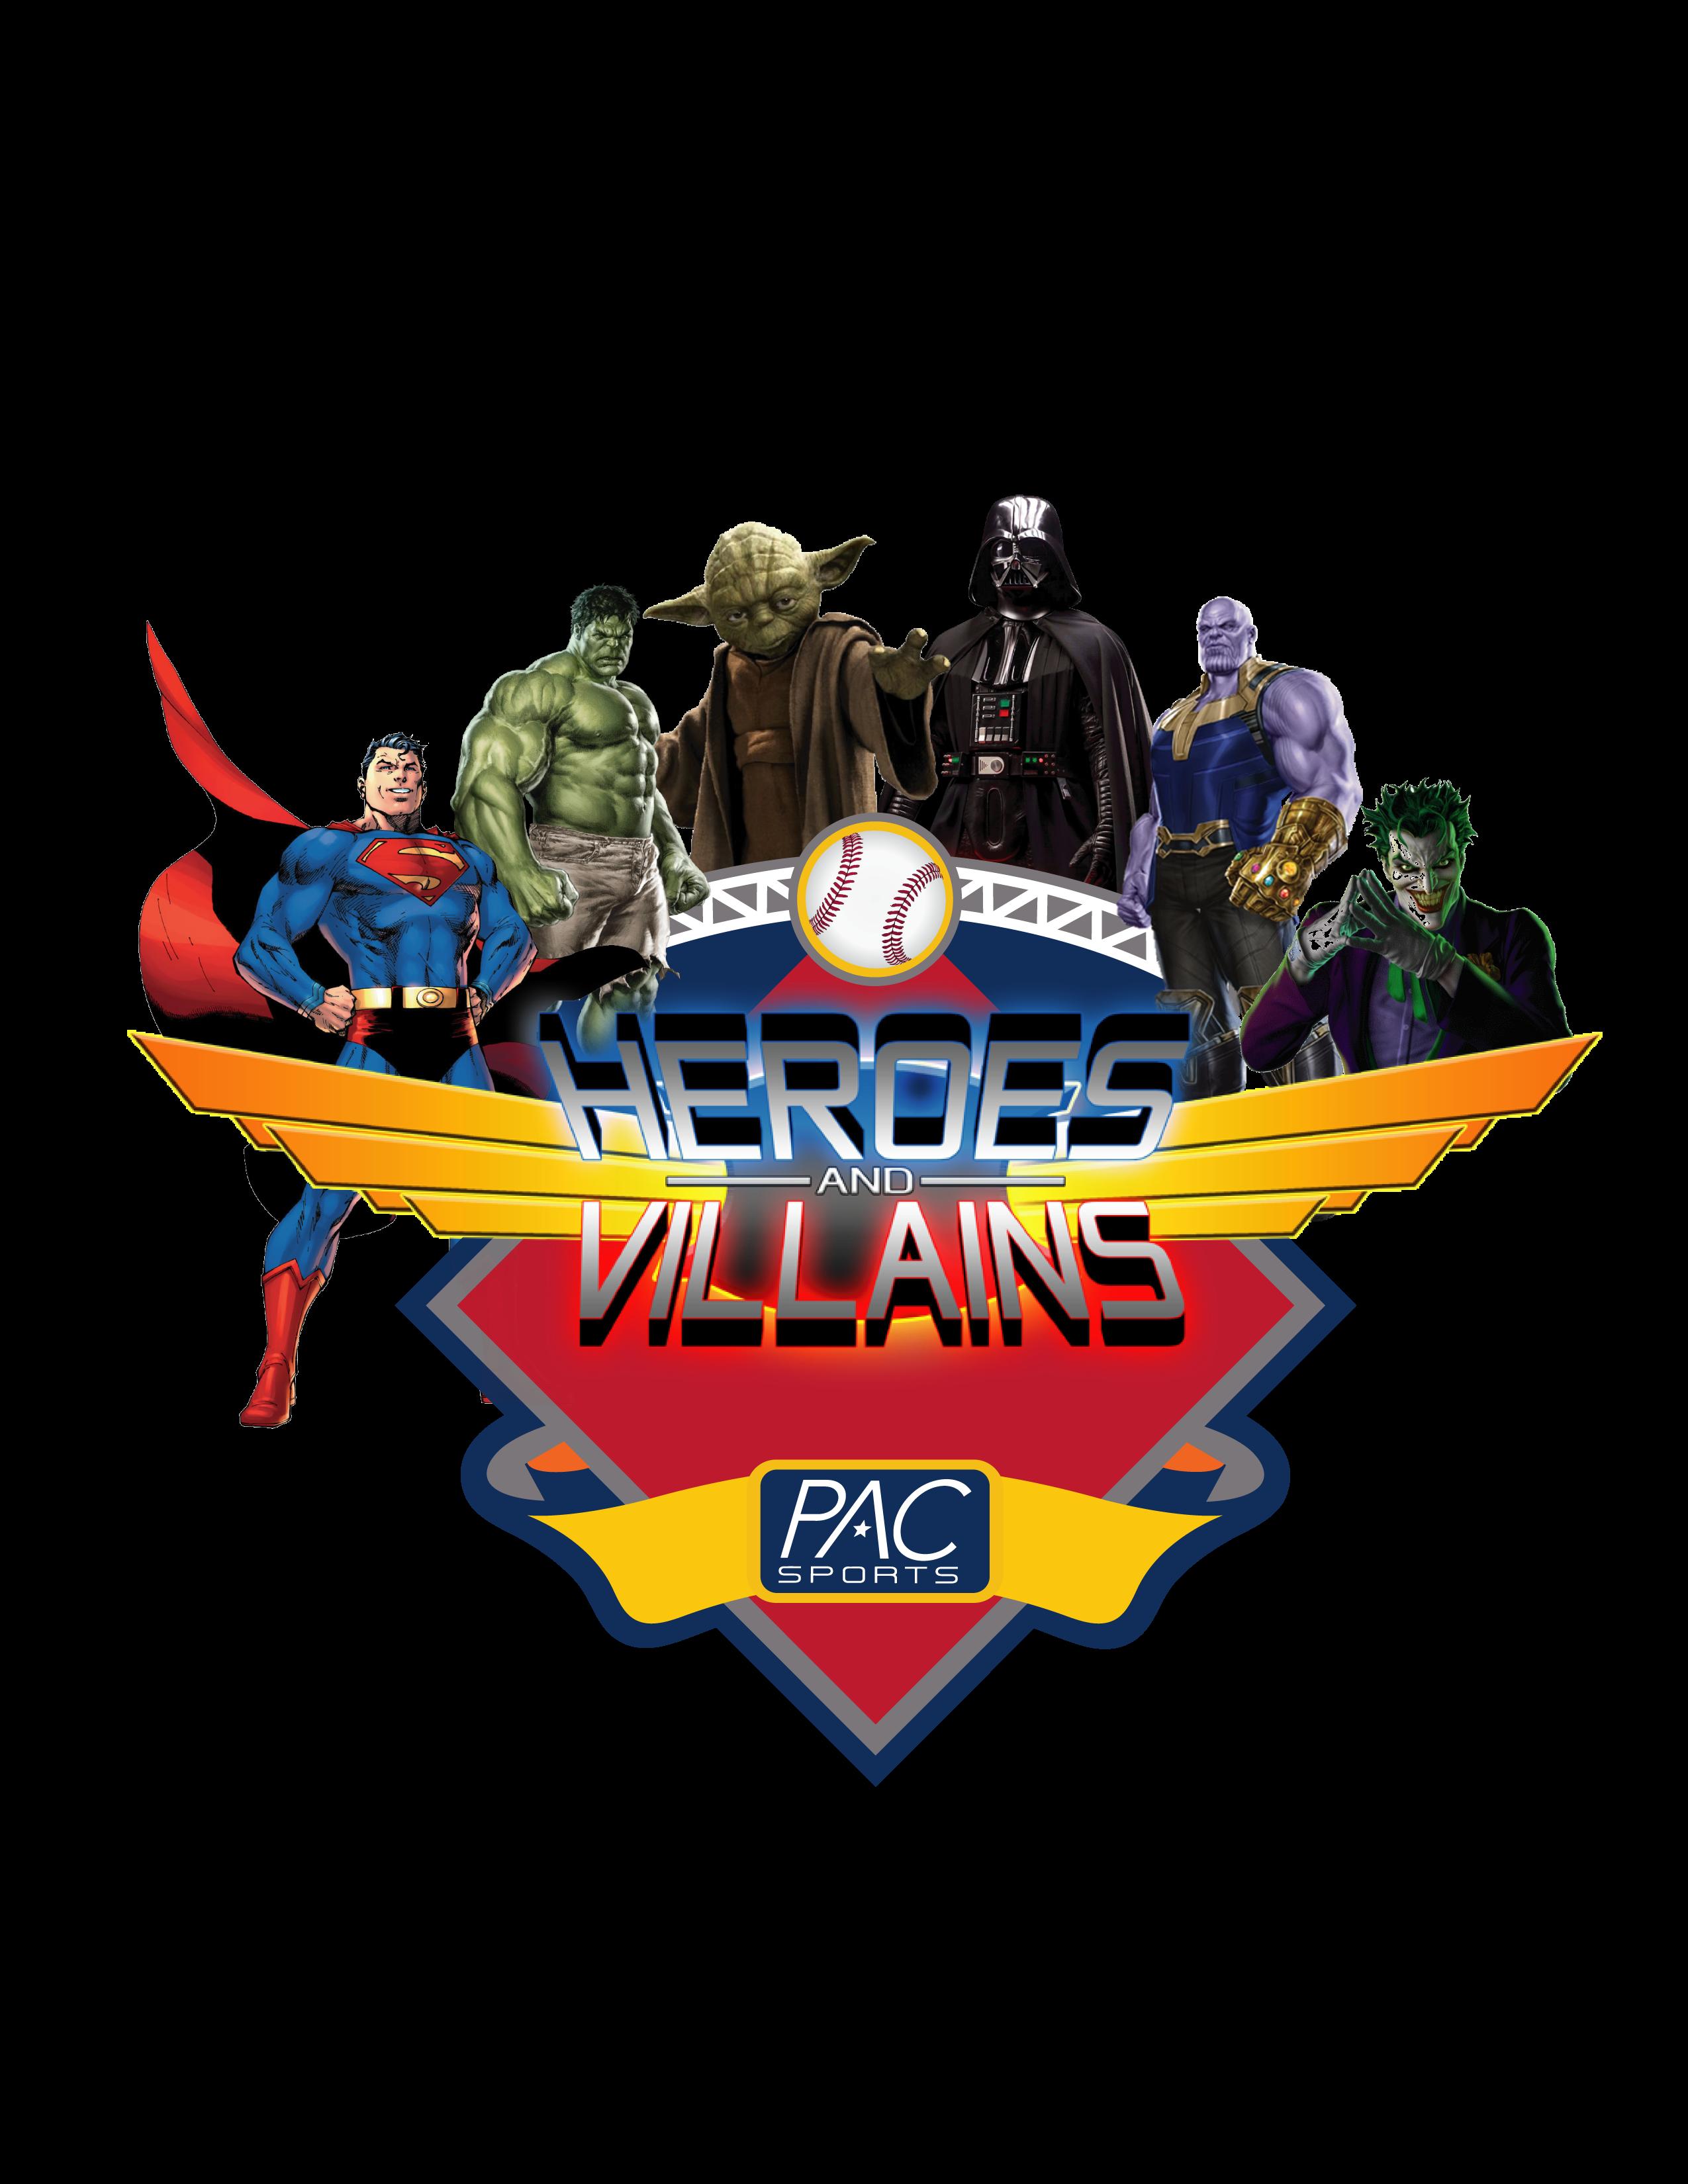 Heroes_Villains-01.png